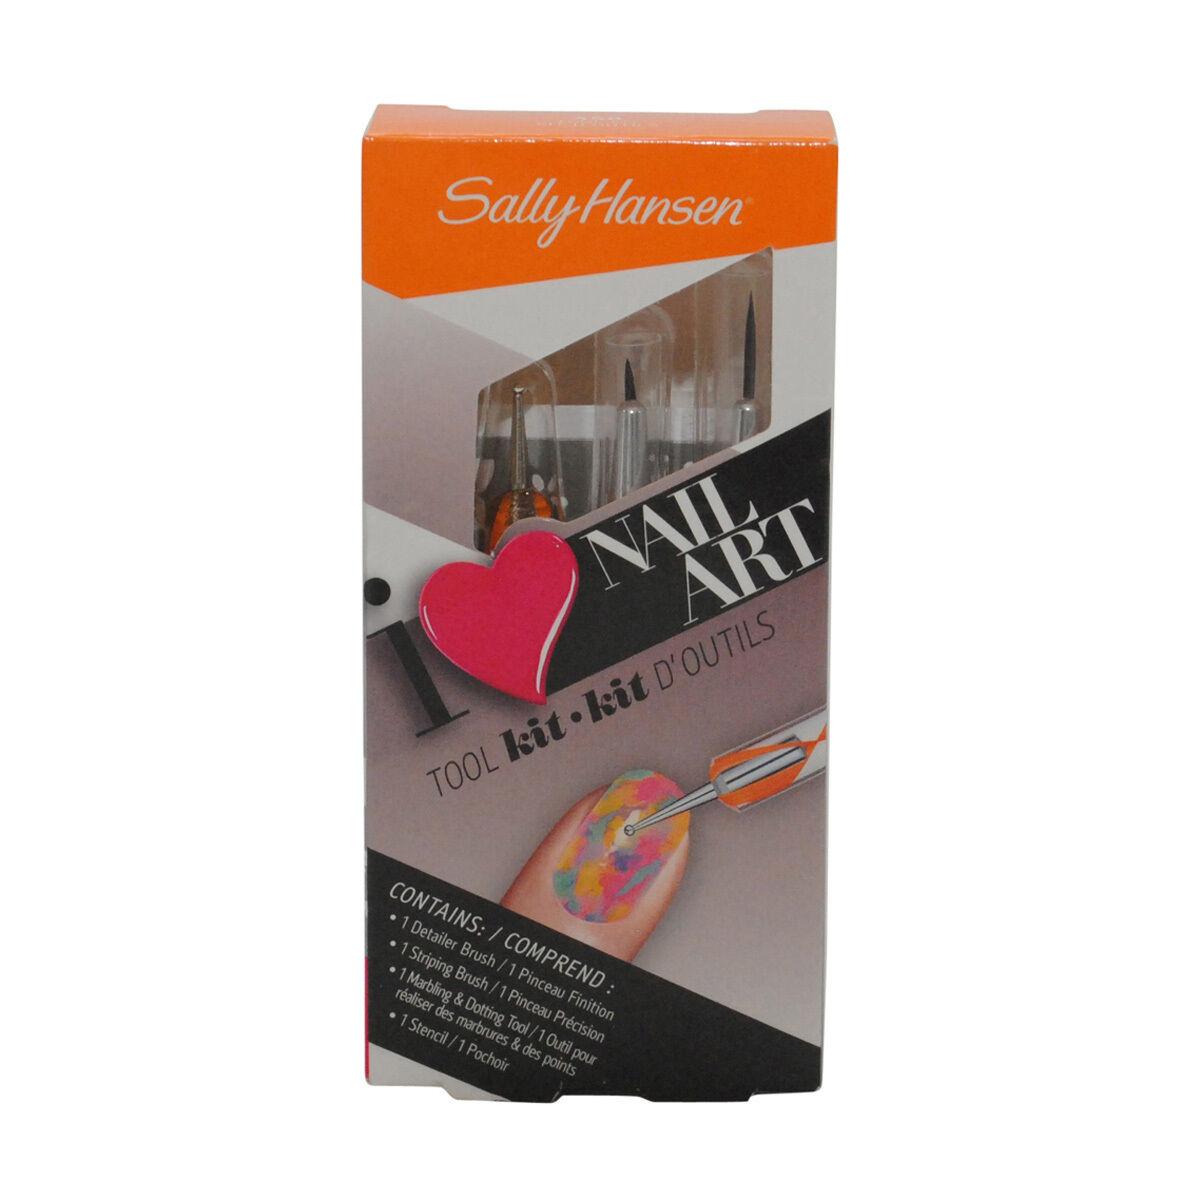 Sally Hansen Nail Art Tool Kit Tools 450 787461570623 | eBay